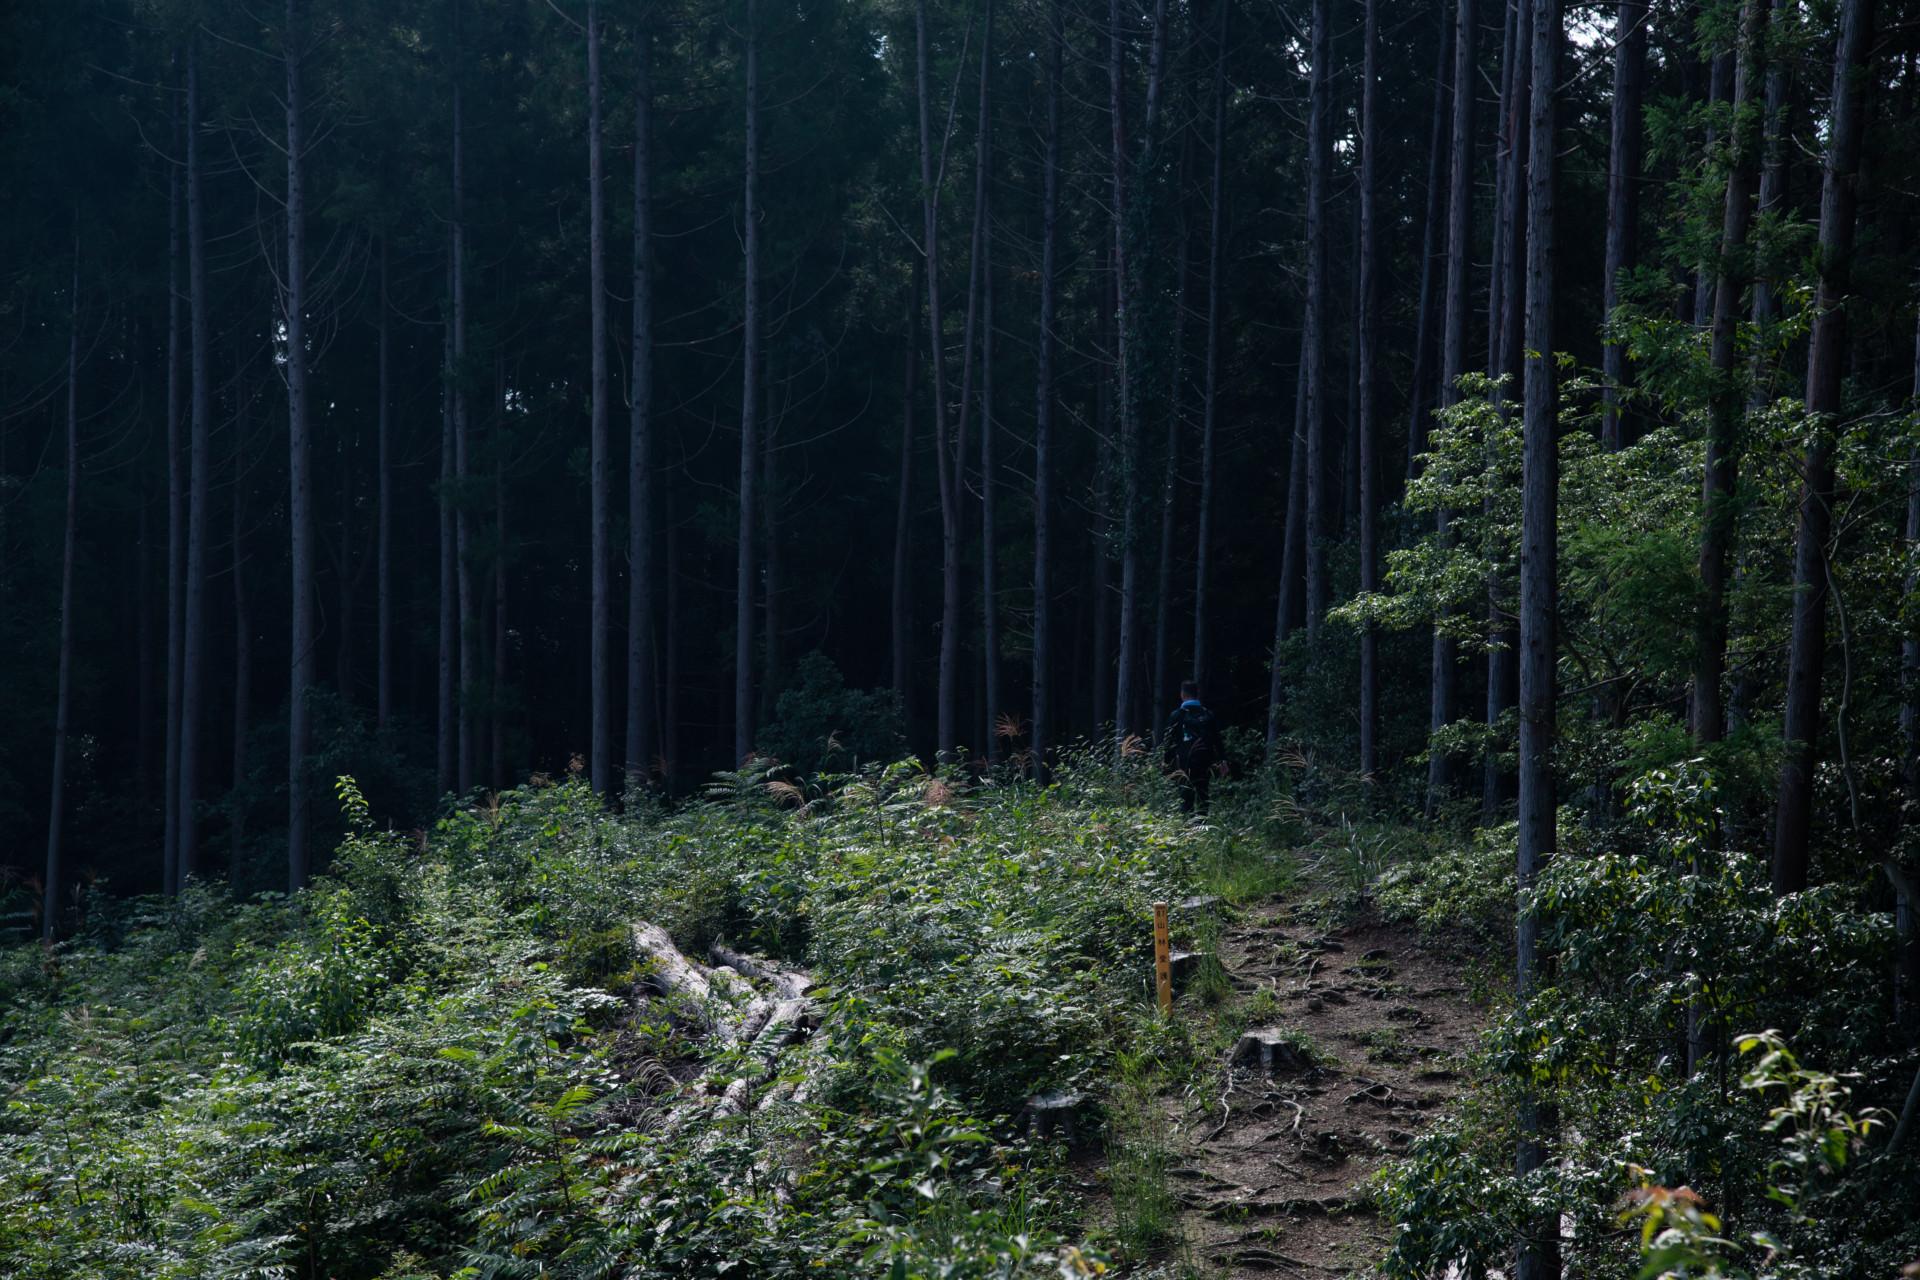 DSC_8067 登山録 今熊山(八王子市上川町)